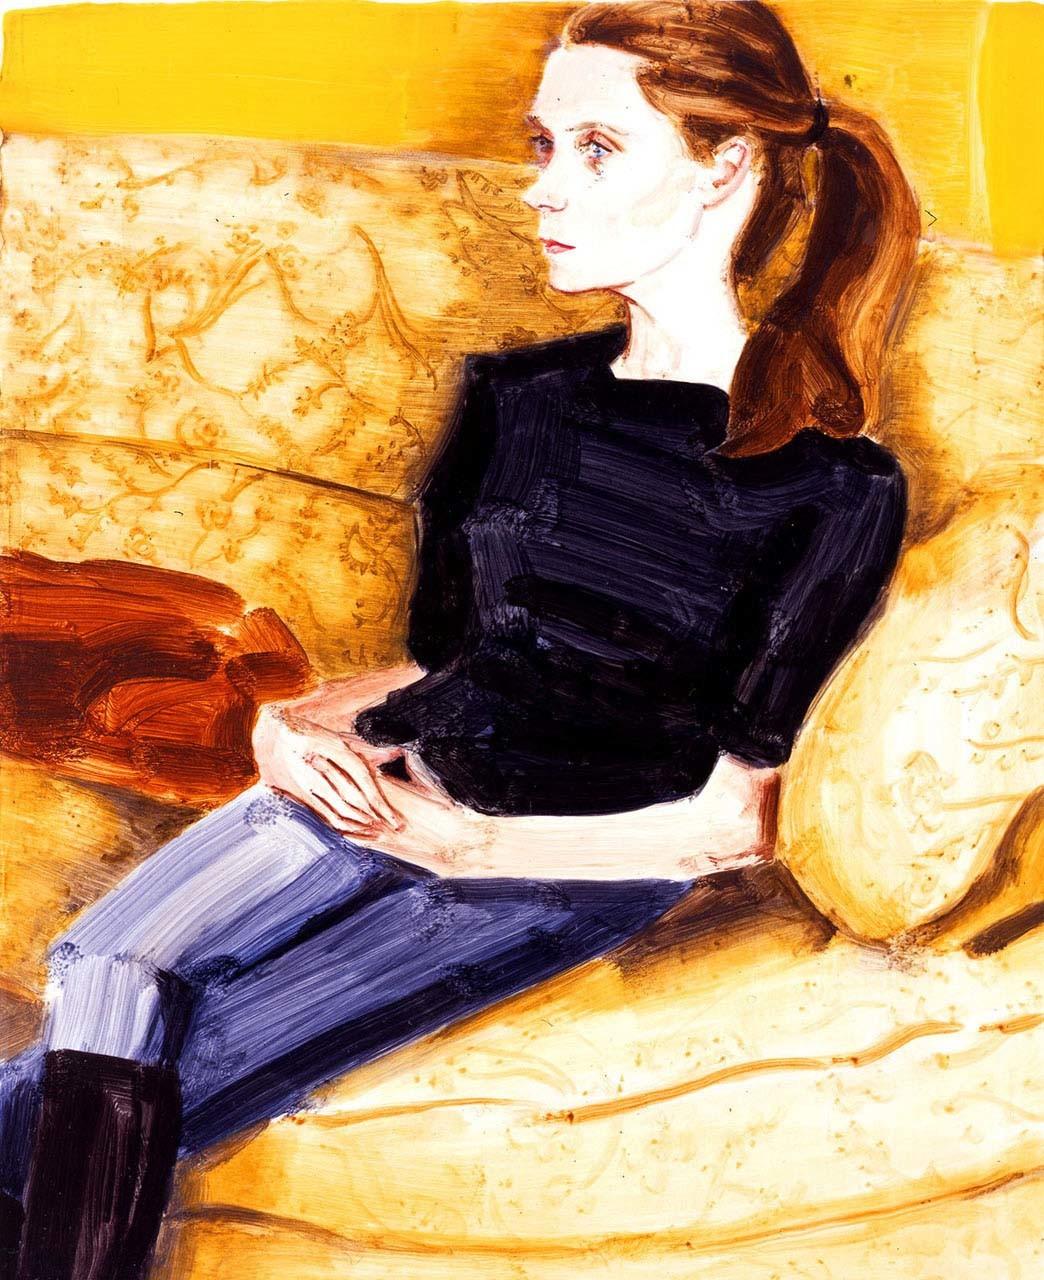 "<div class=""artwork_caption""><p>Pauline (Pauline Daly), 2005</p></div>"